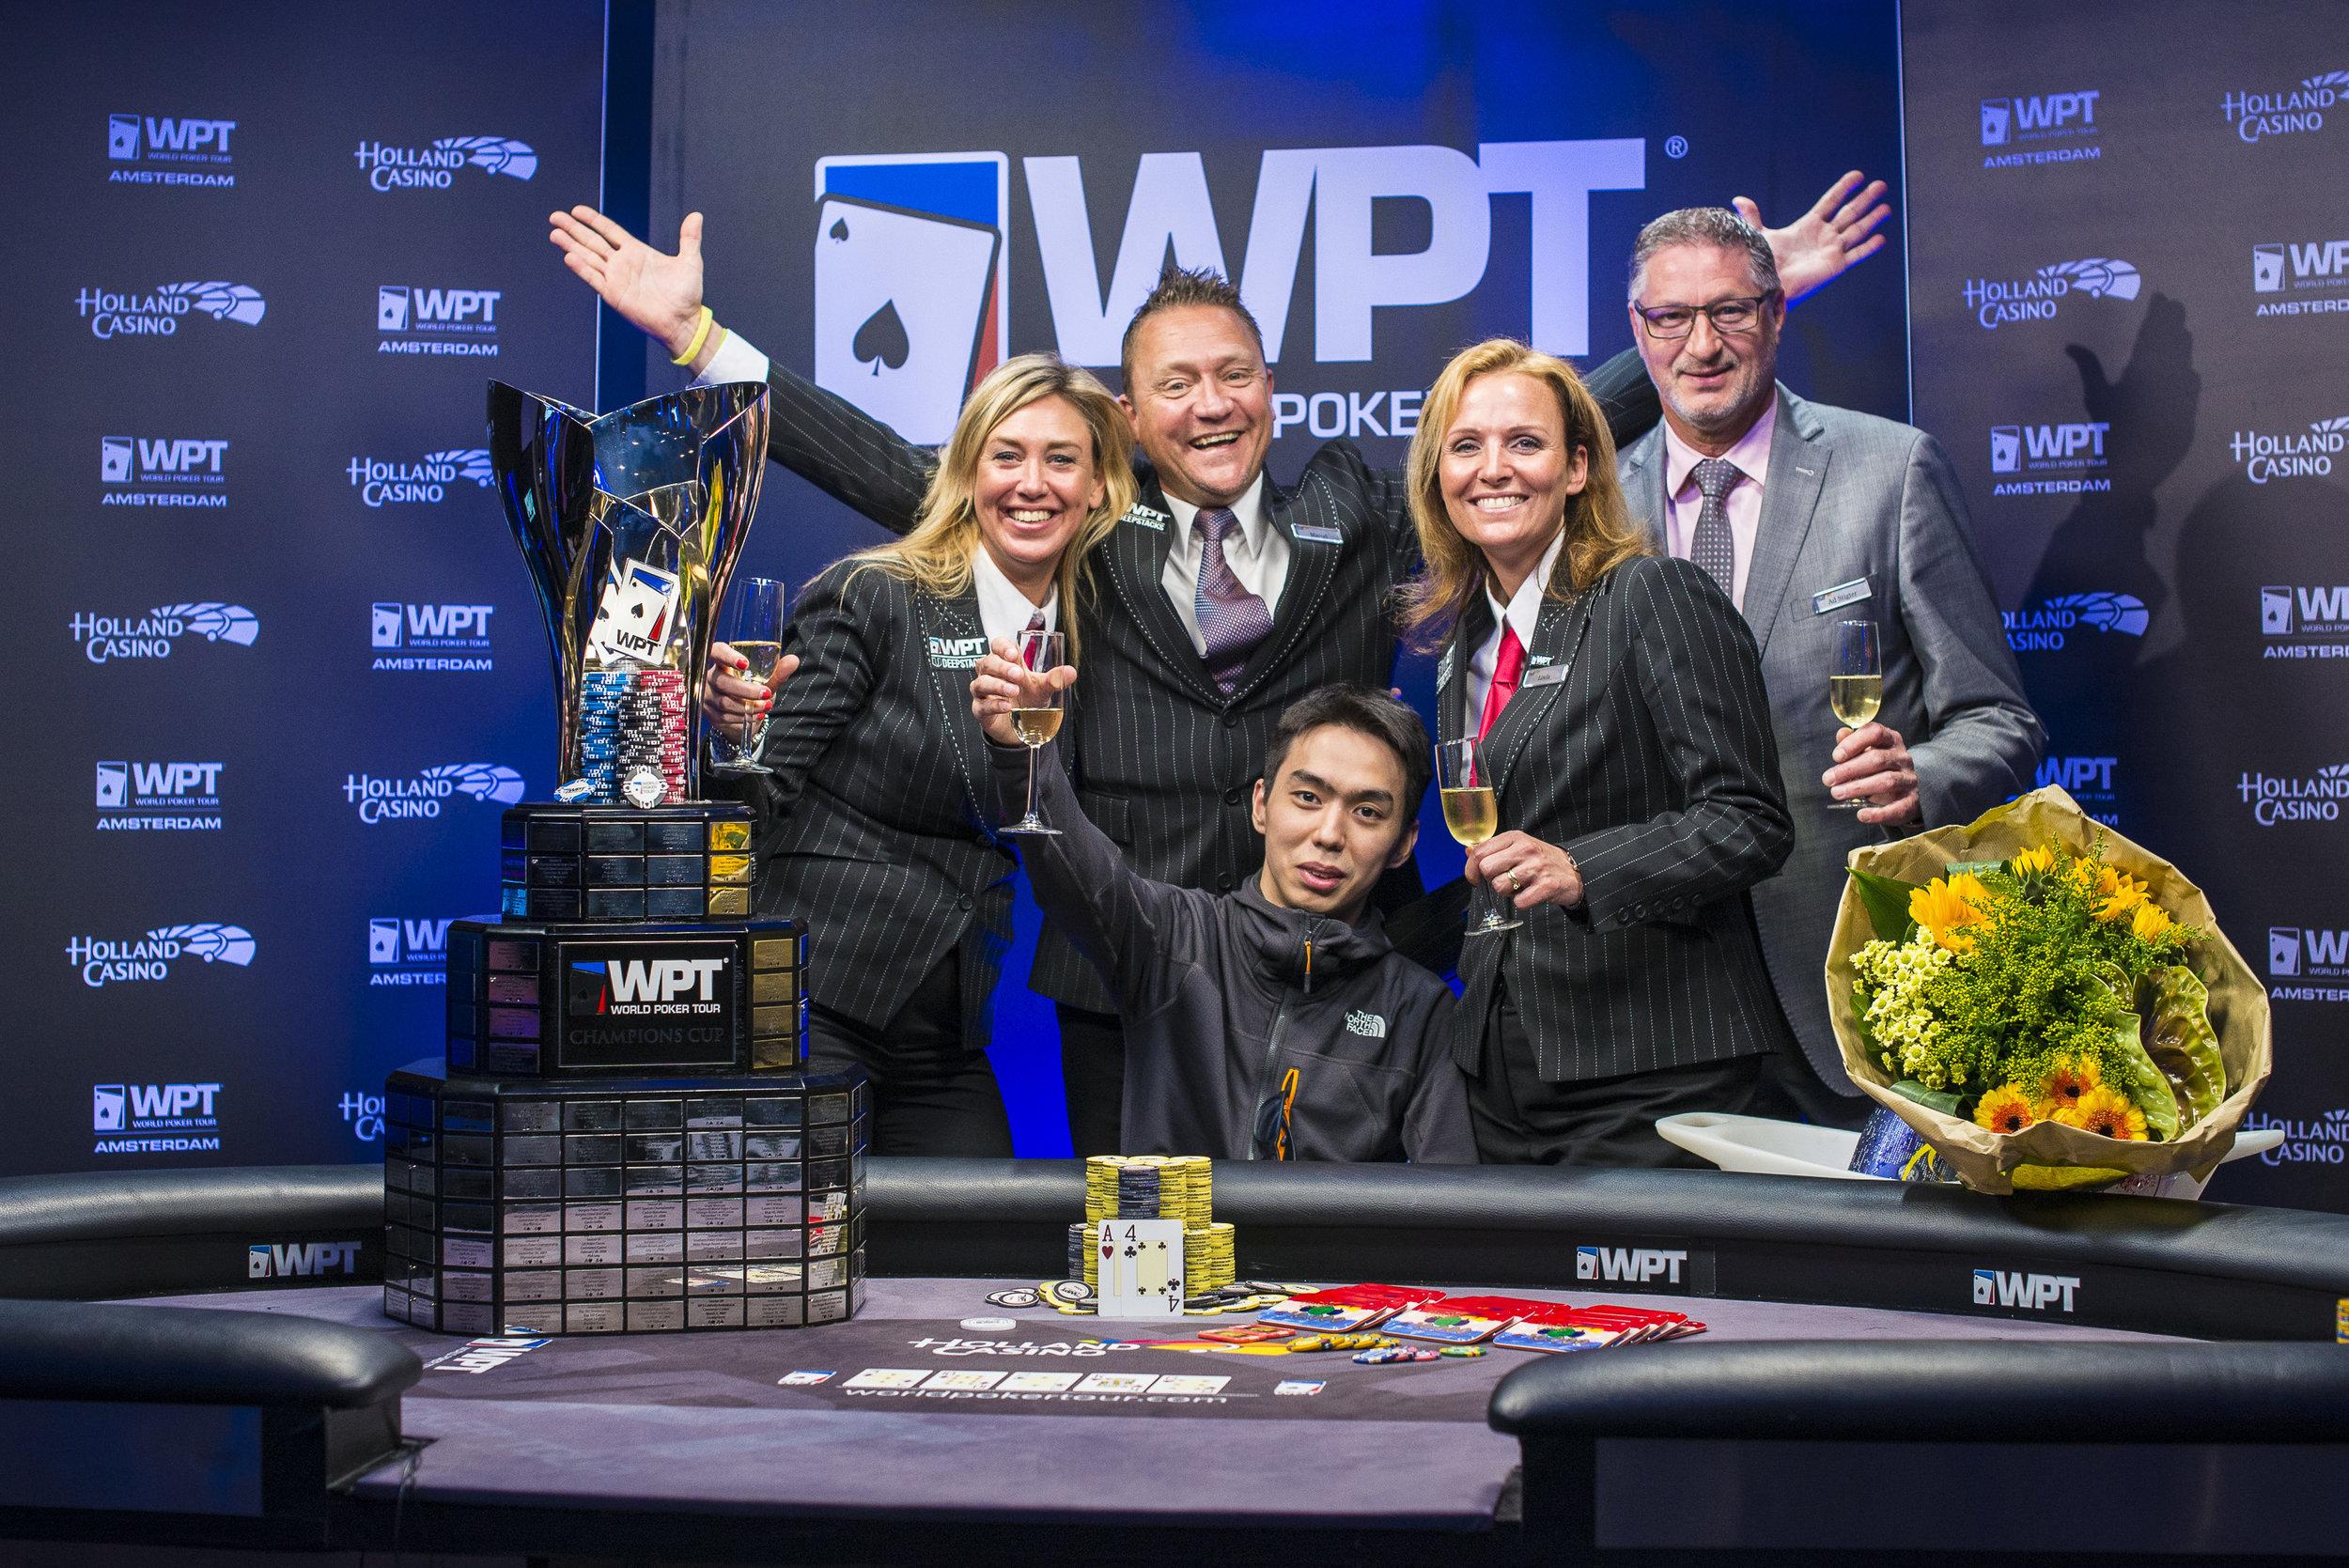 World Poker Tour_Daniel Danivar Wins WPT Amsterdam! _DA65416.jpg